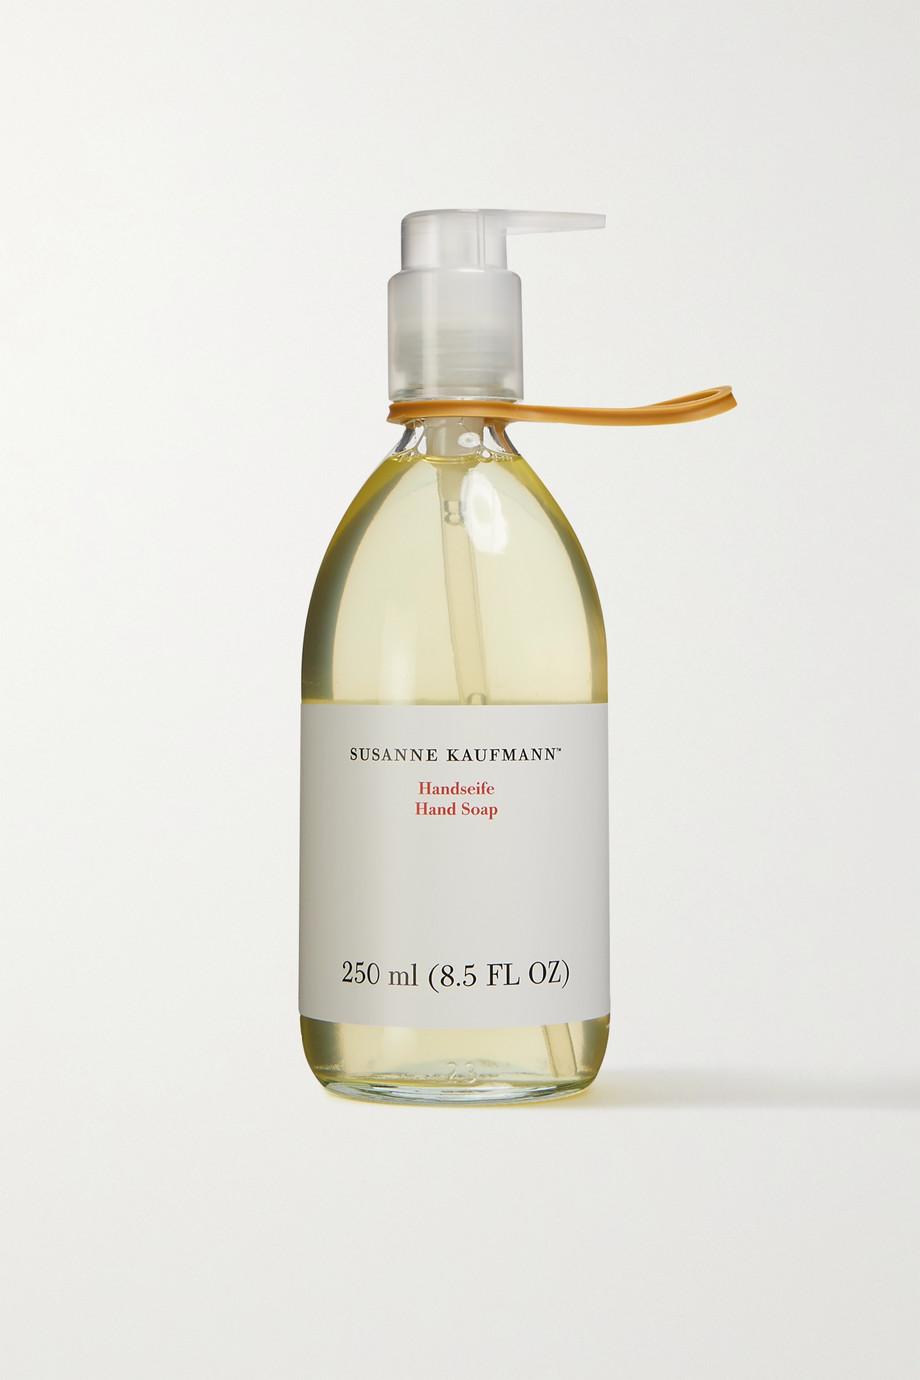 Susanne Kaufmann Hand Soap, 250ml